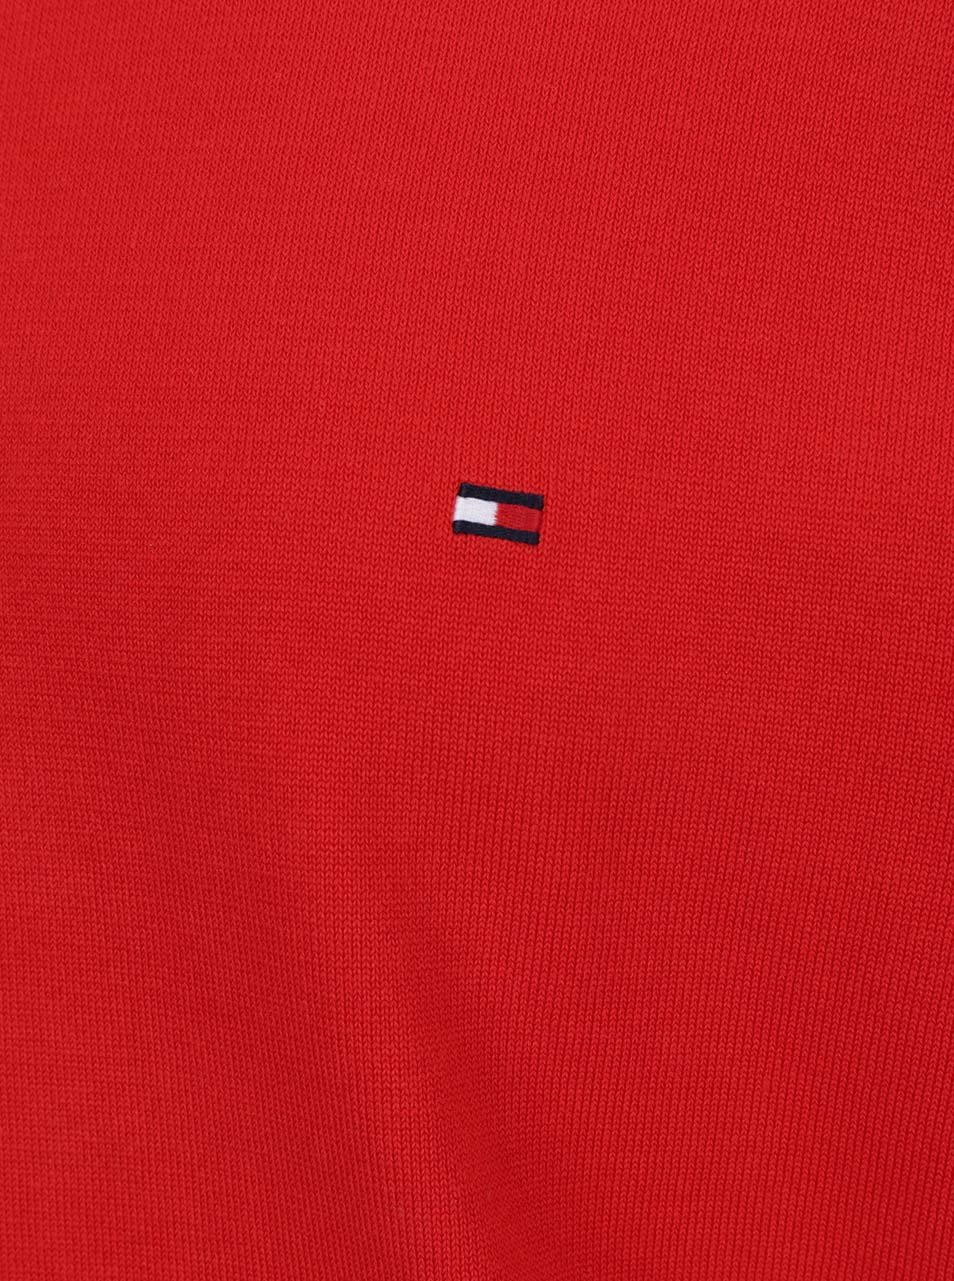 Červený pánsky sveter Tommy Hilfiger ... eaeaa2c7cde